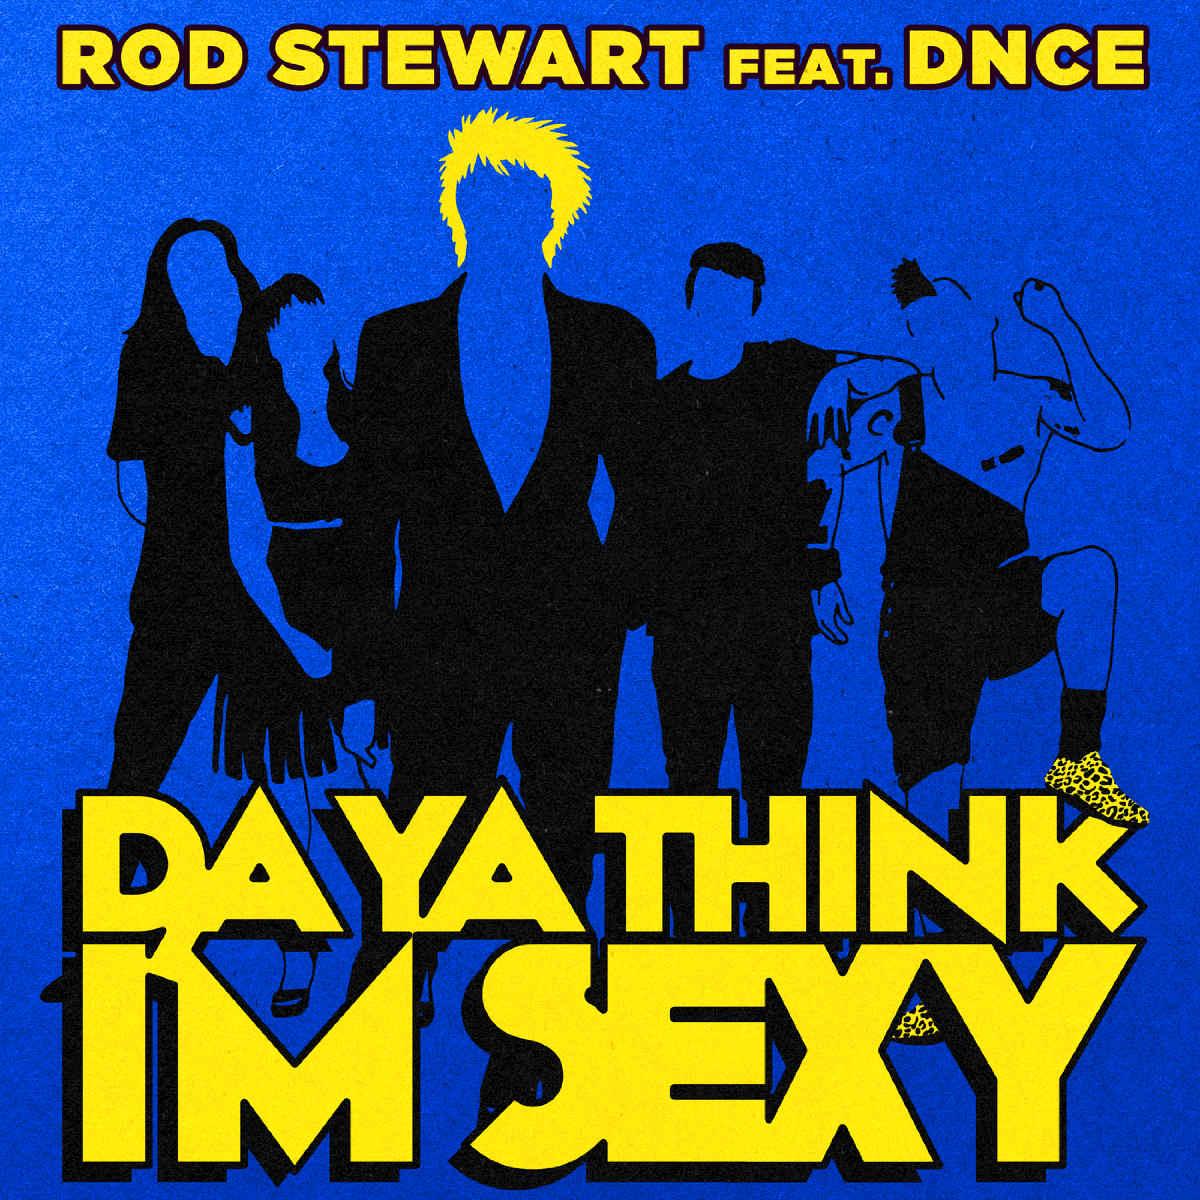 Rod stewart greatest hits cd maggie may, hot legs, do ya think i'm sexy